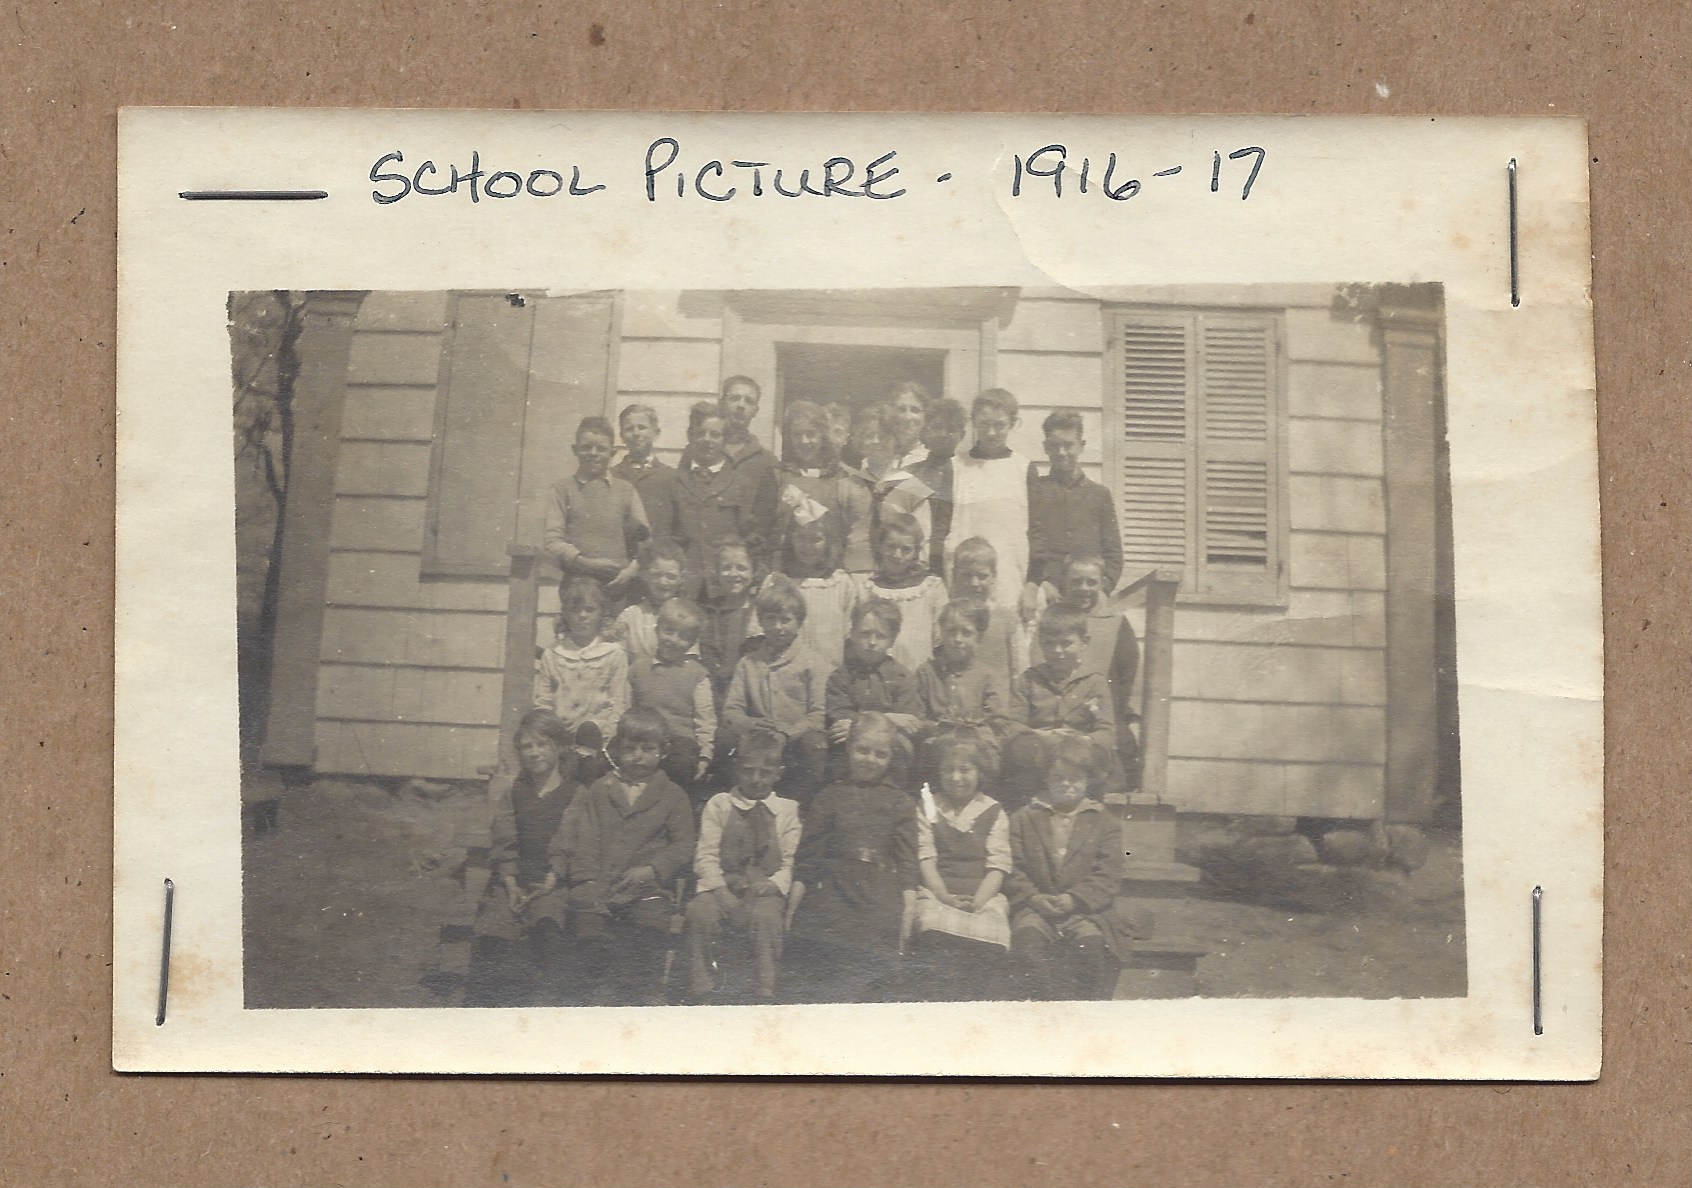 4.1916-17 School Picture